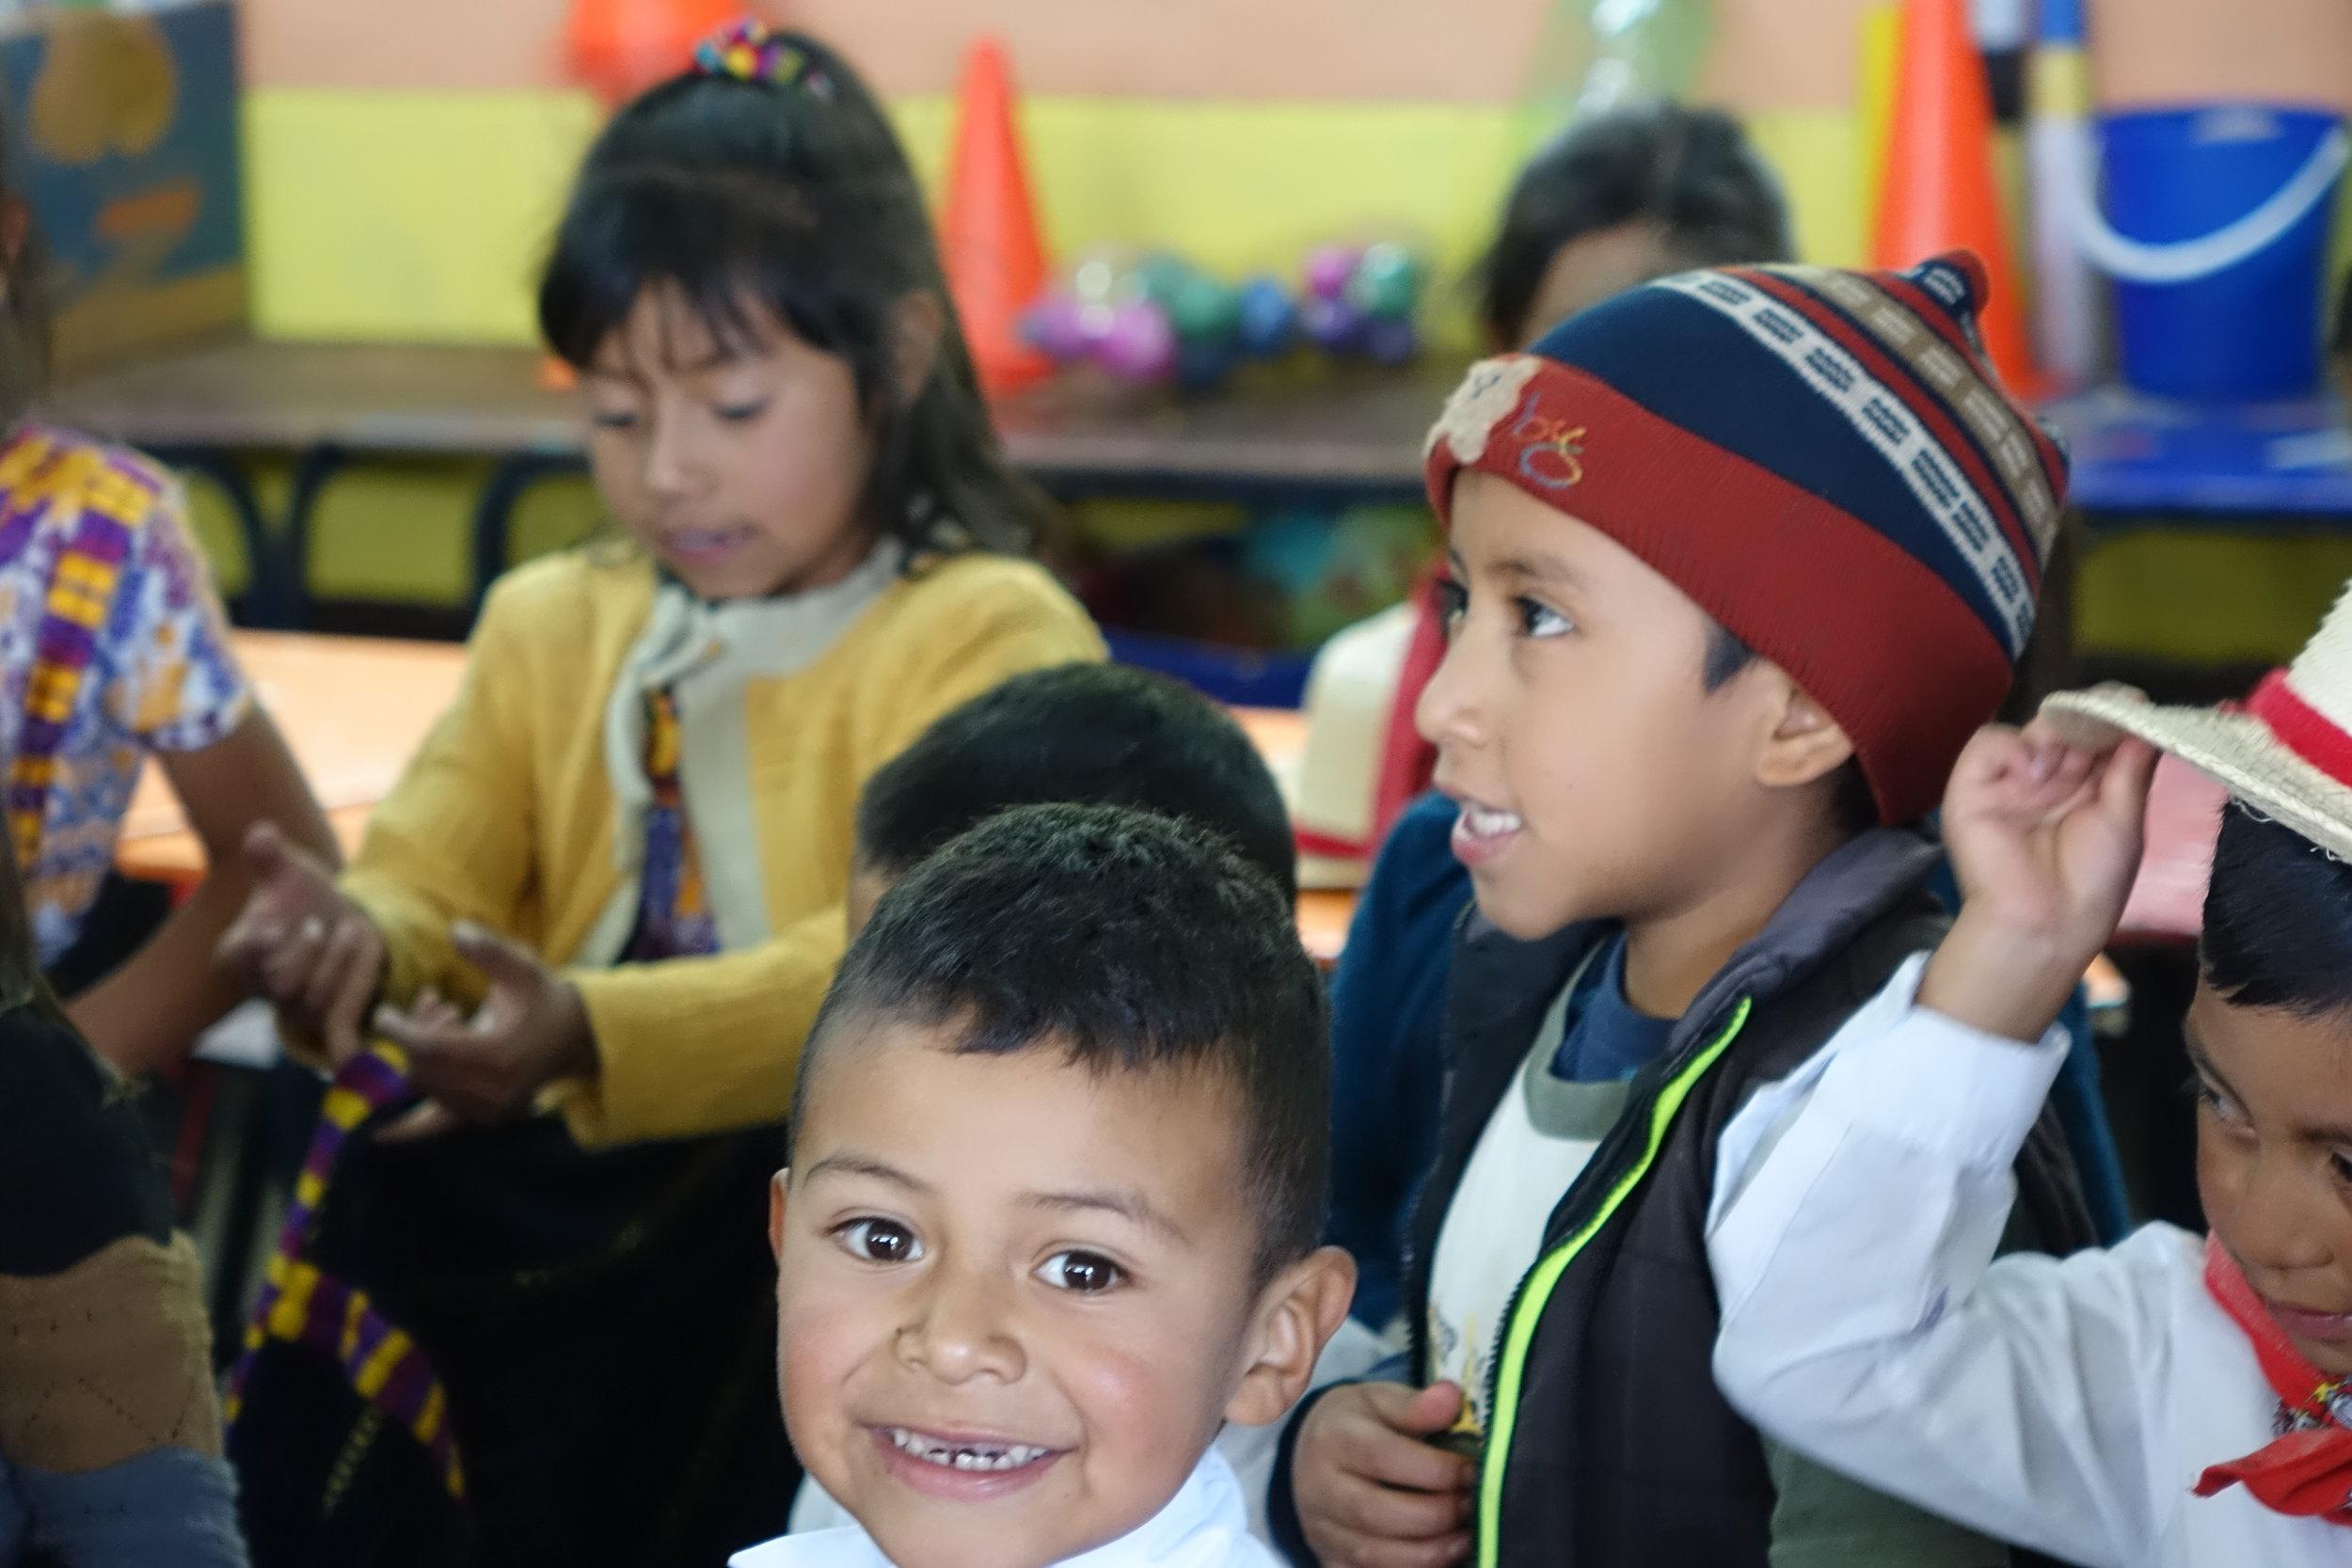 021_Guatemala_Vivamos Mejor CEIBI (36).JPG